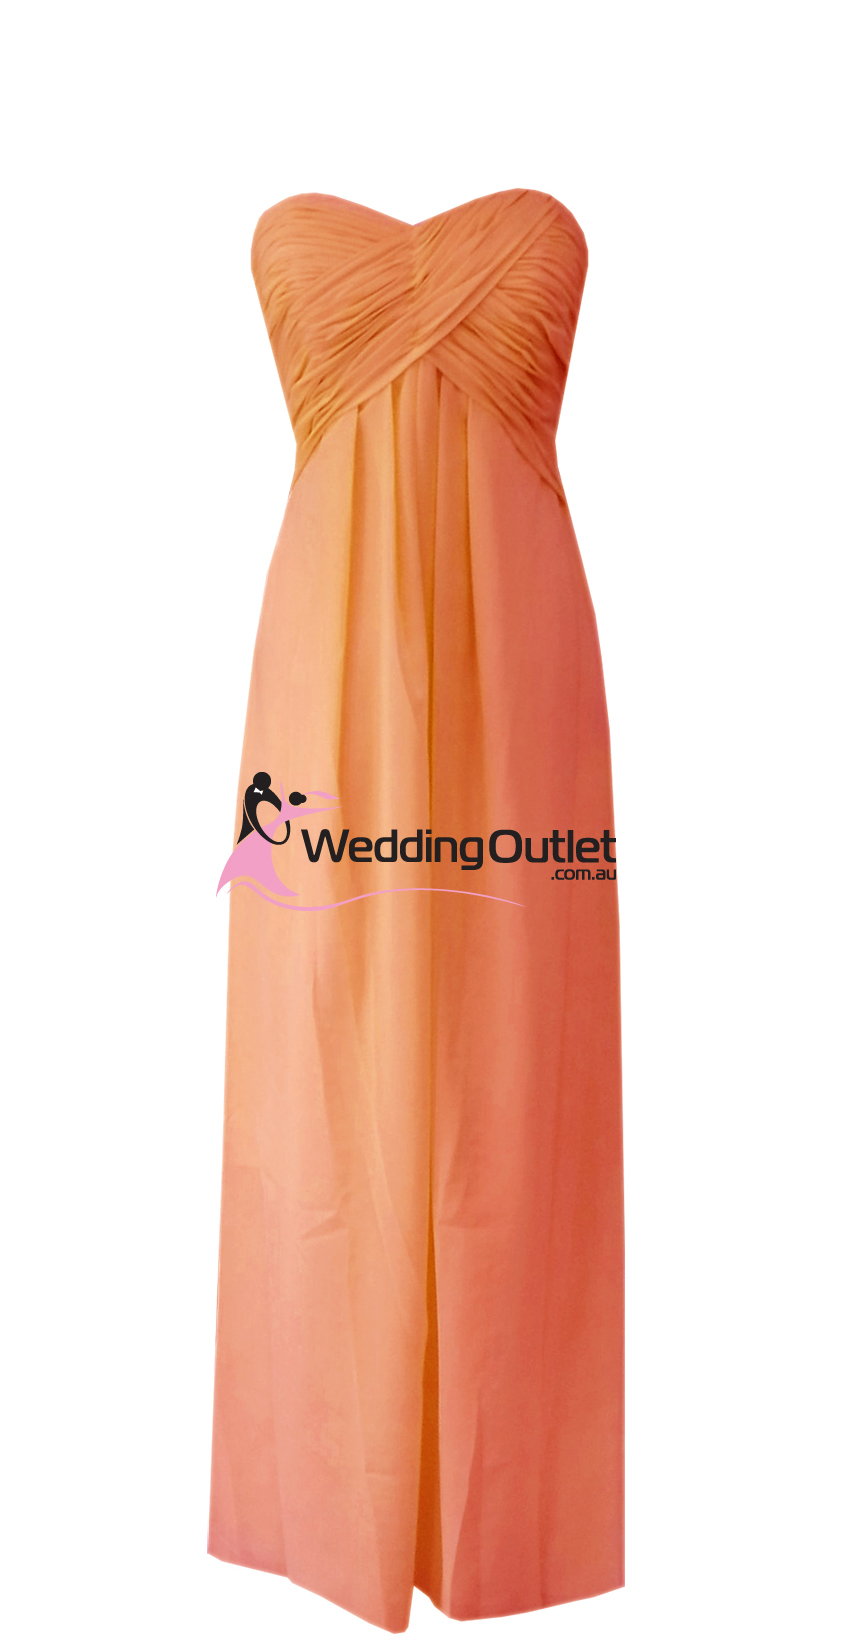 Burnt orange bridesmaid dresses style r101 weddingoutlet burnt orange bridesmaid dresses style r101 ombrellifo Images